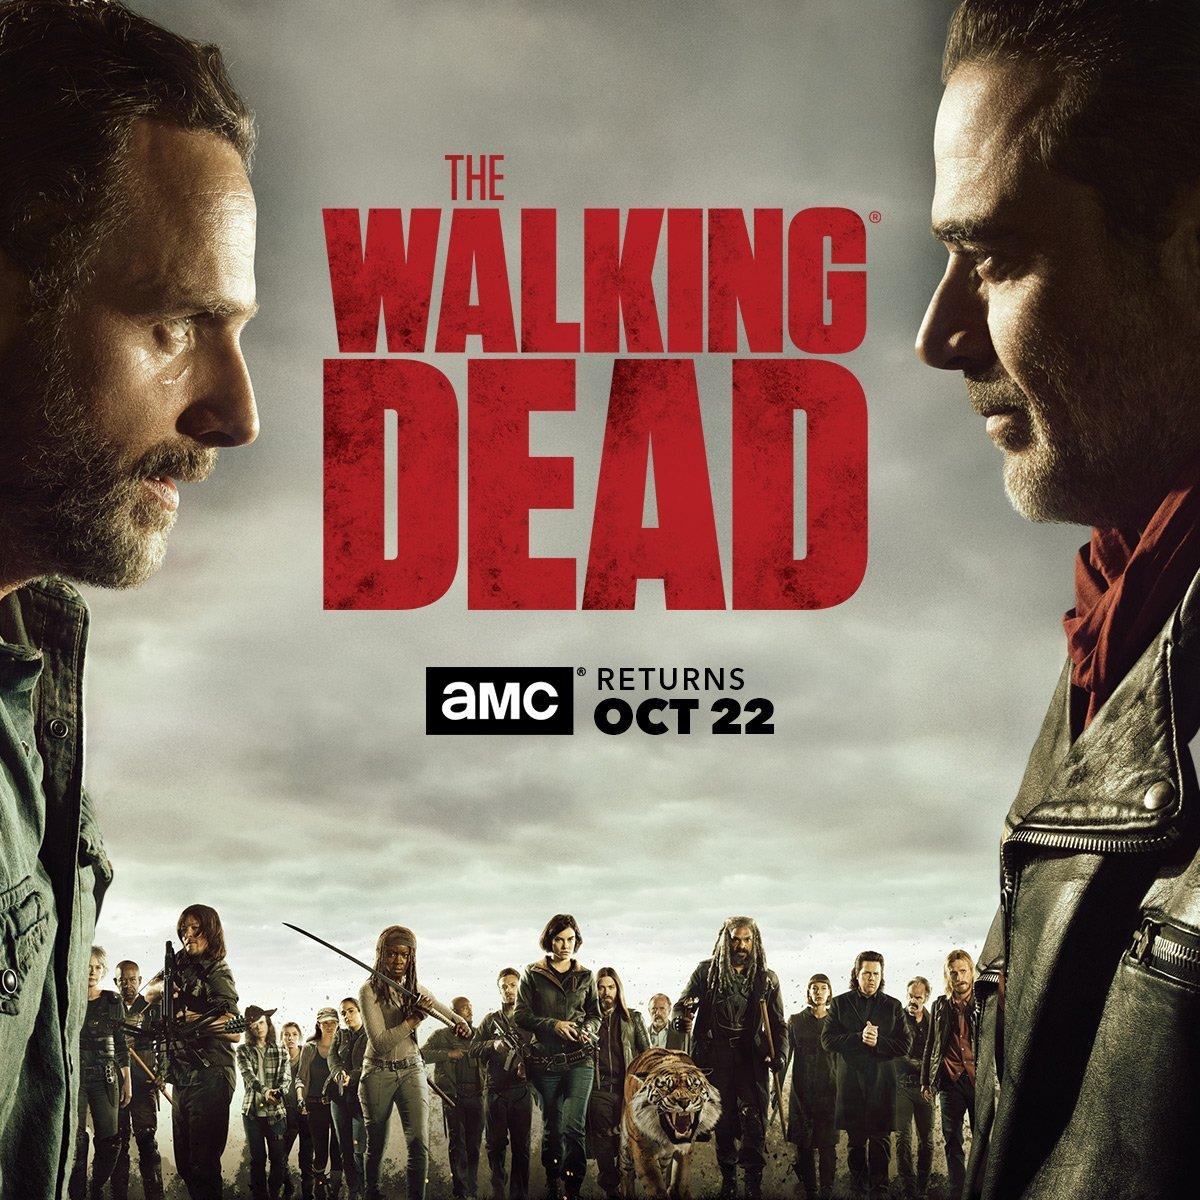 Assistir The Walking Dead 8×3 Torrent 720p Dublado 1080p Download Online